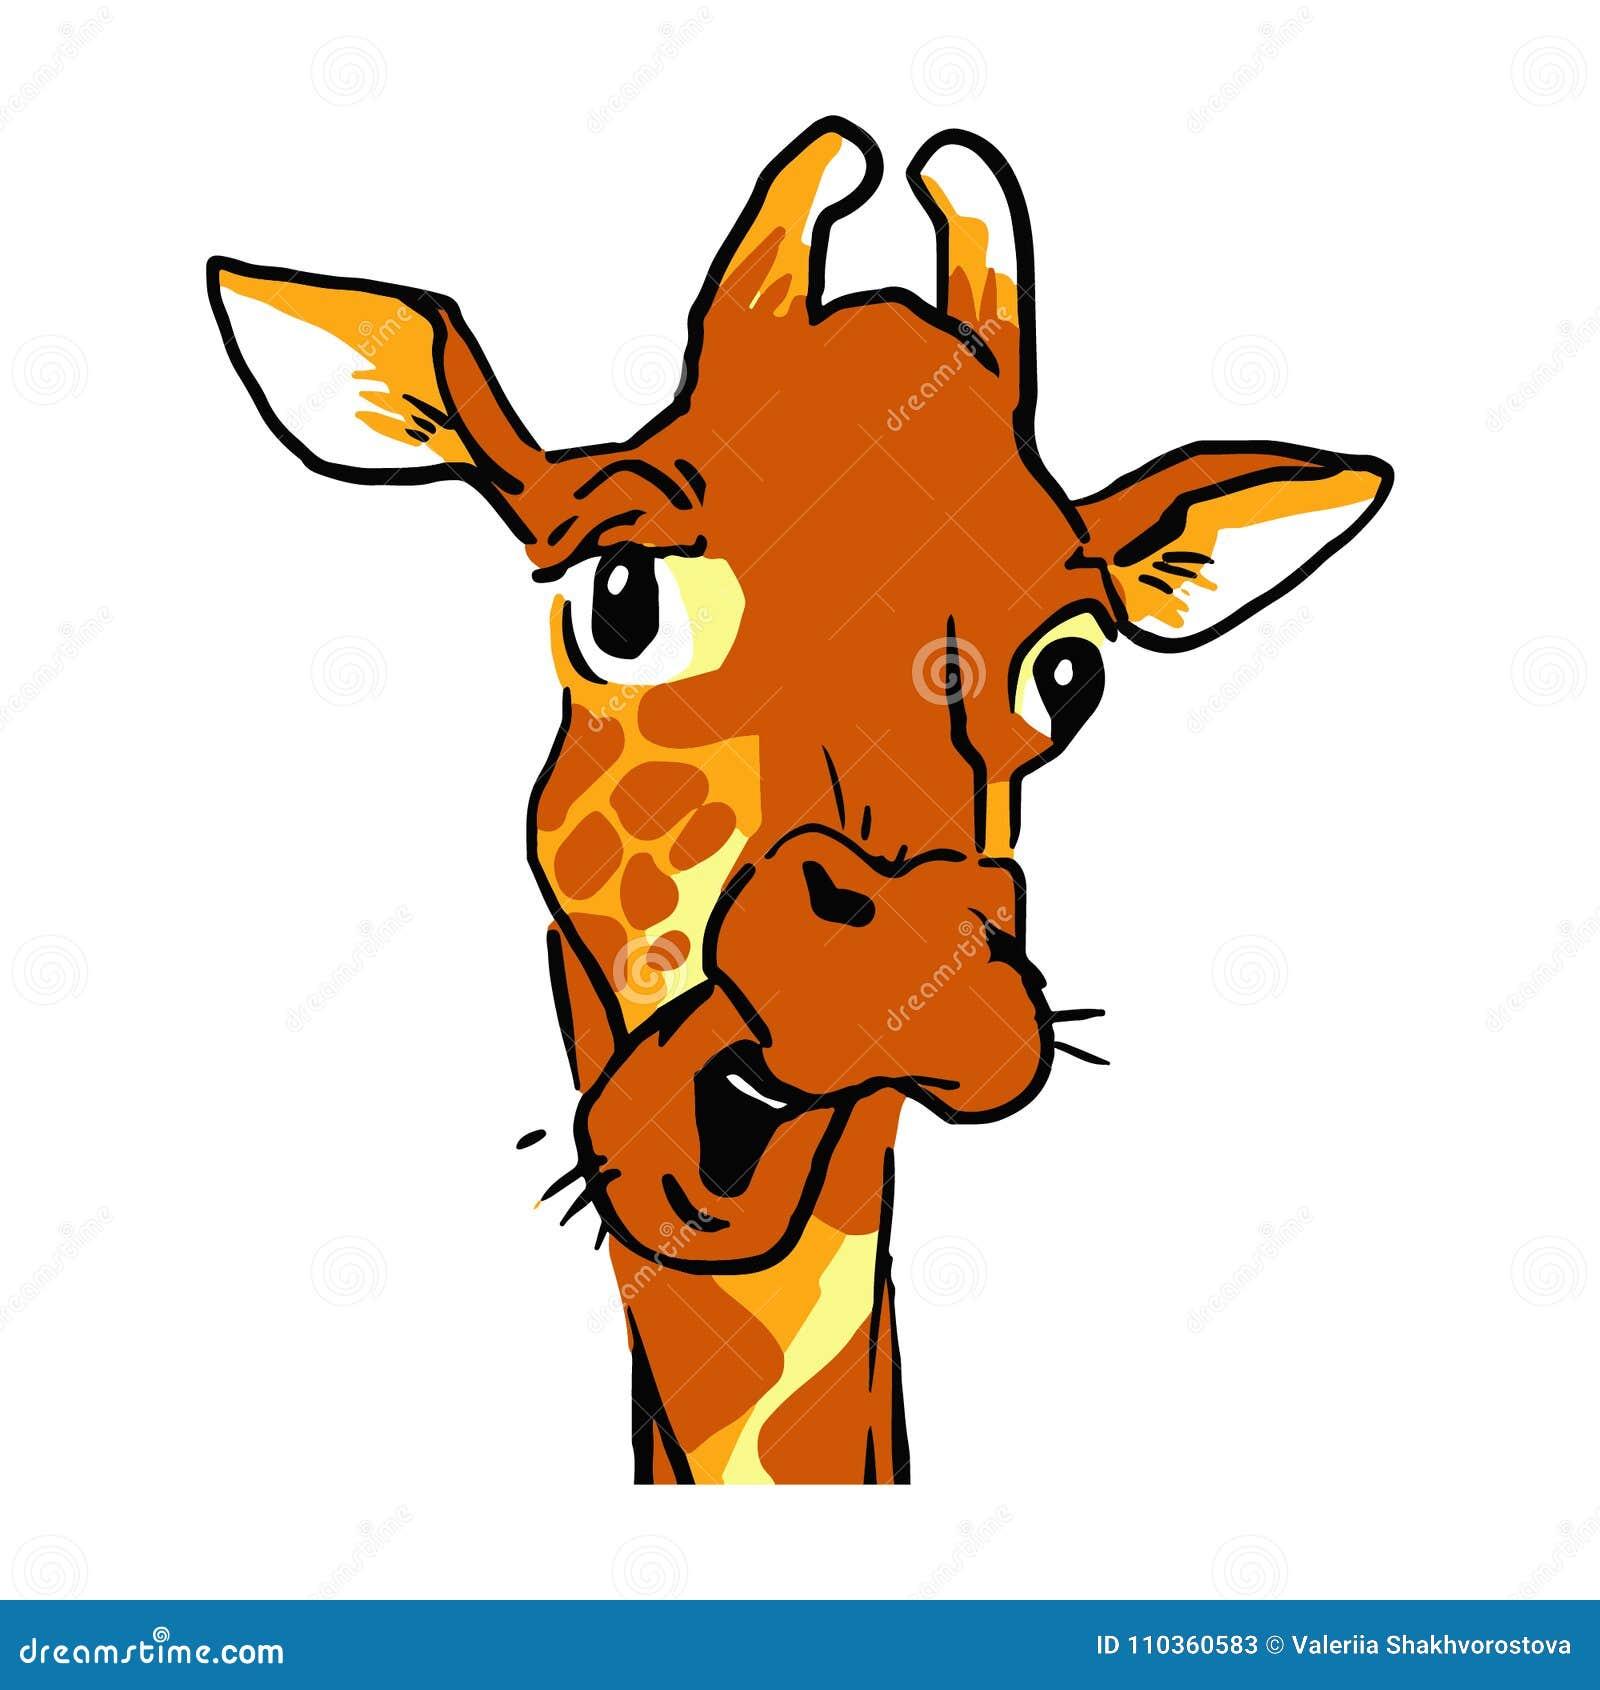 funny cartoon talking giraffe headshot emotion face of a giraffe